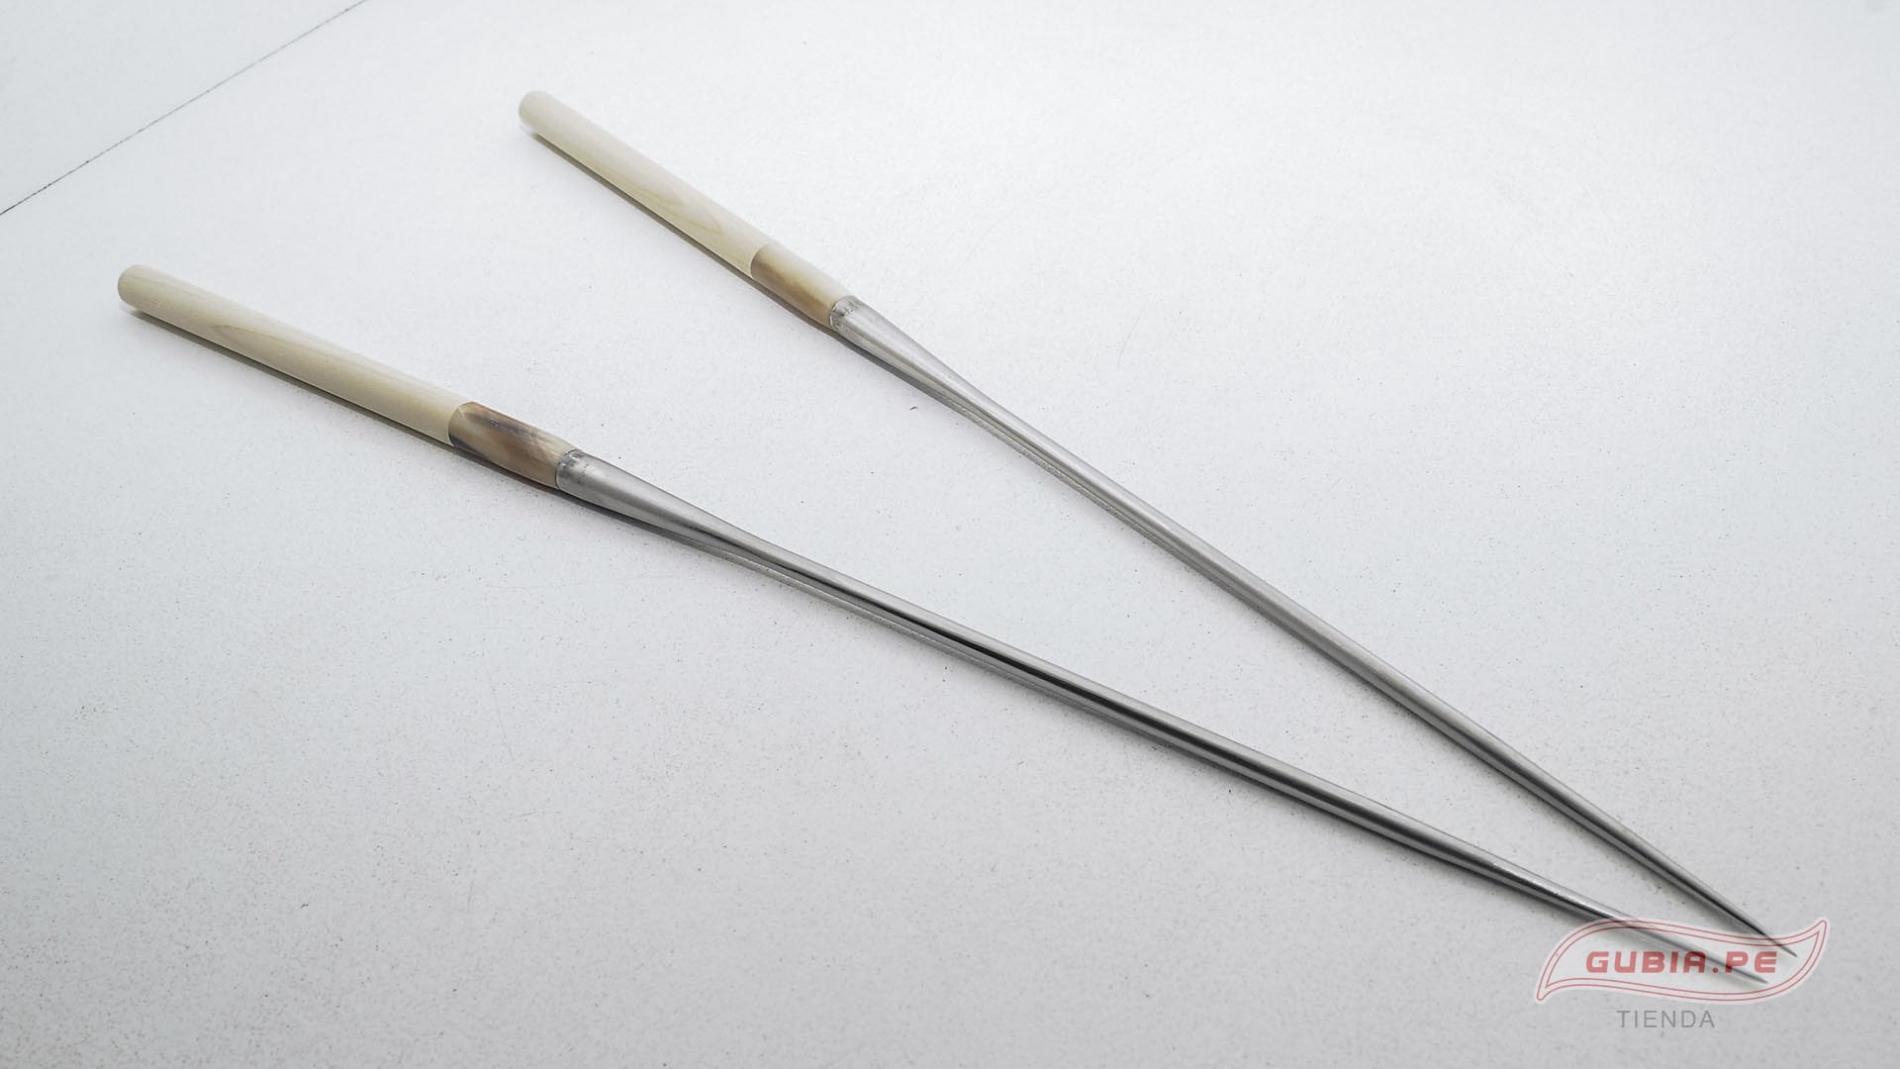 GUB0037-Palitos servir sushi Moribashi Chopsticks metal 21cm GUB0037-max-3.